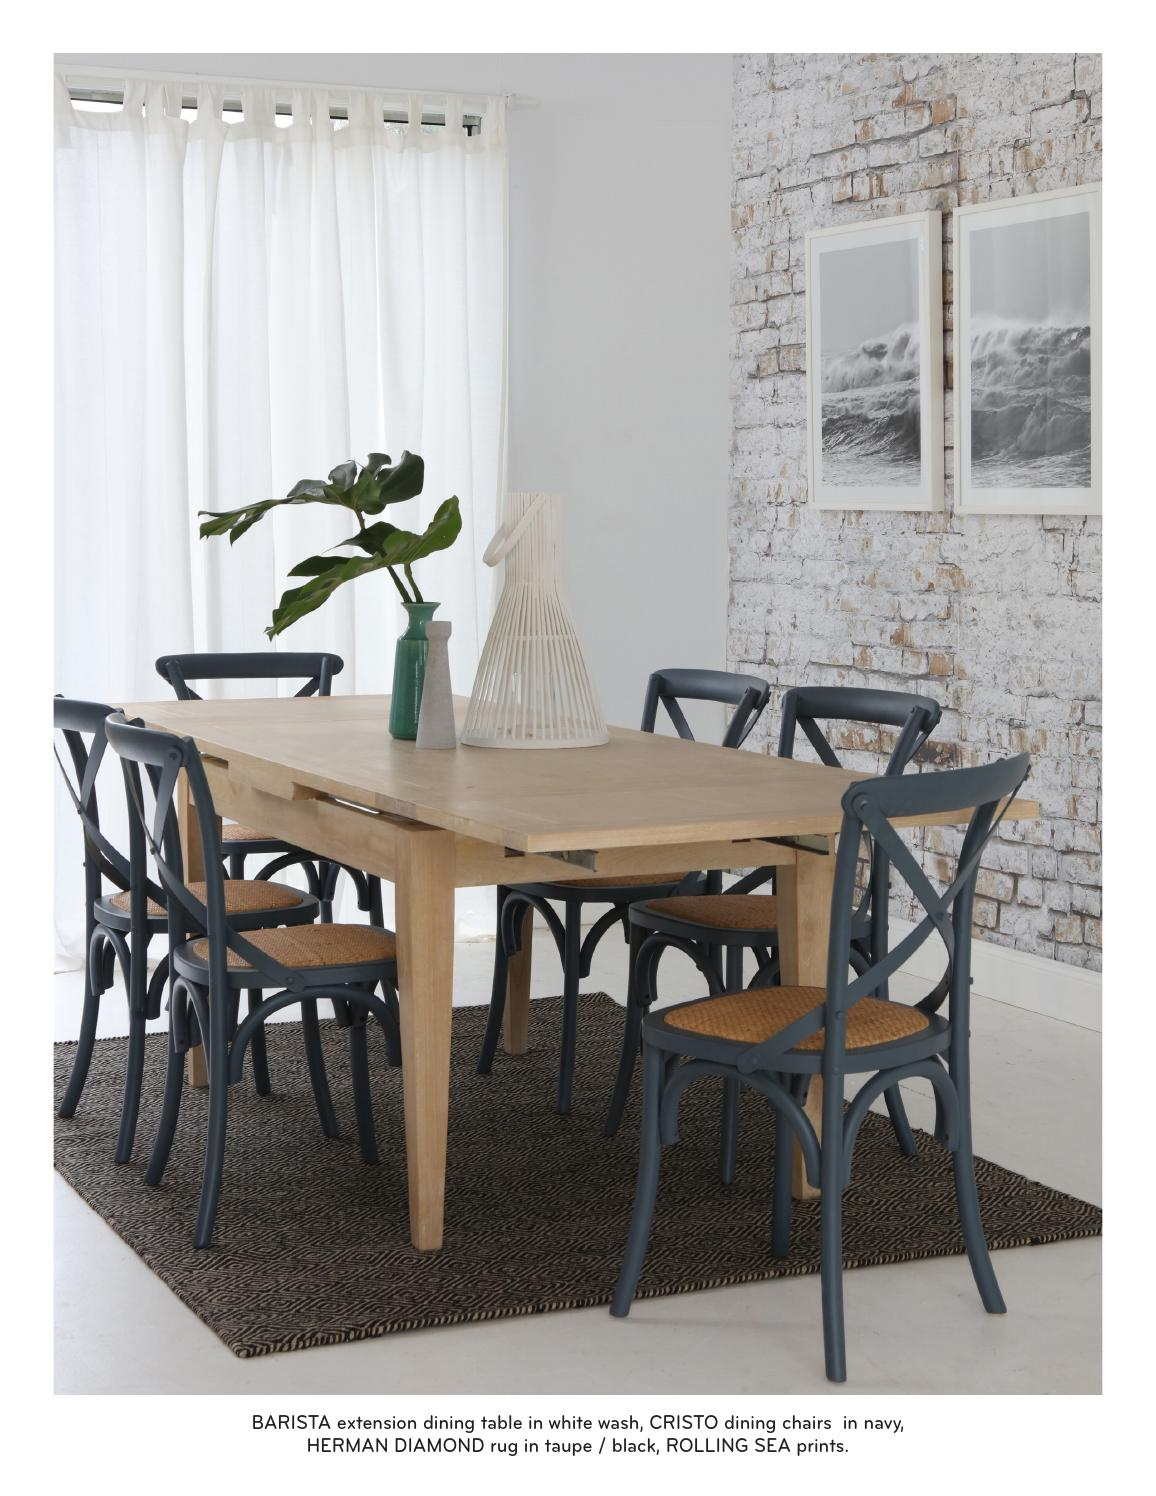 jarvis chair oz design cover rentals warner robins ga modern australian living furniture autumn look